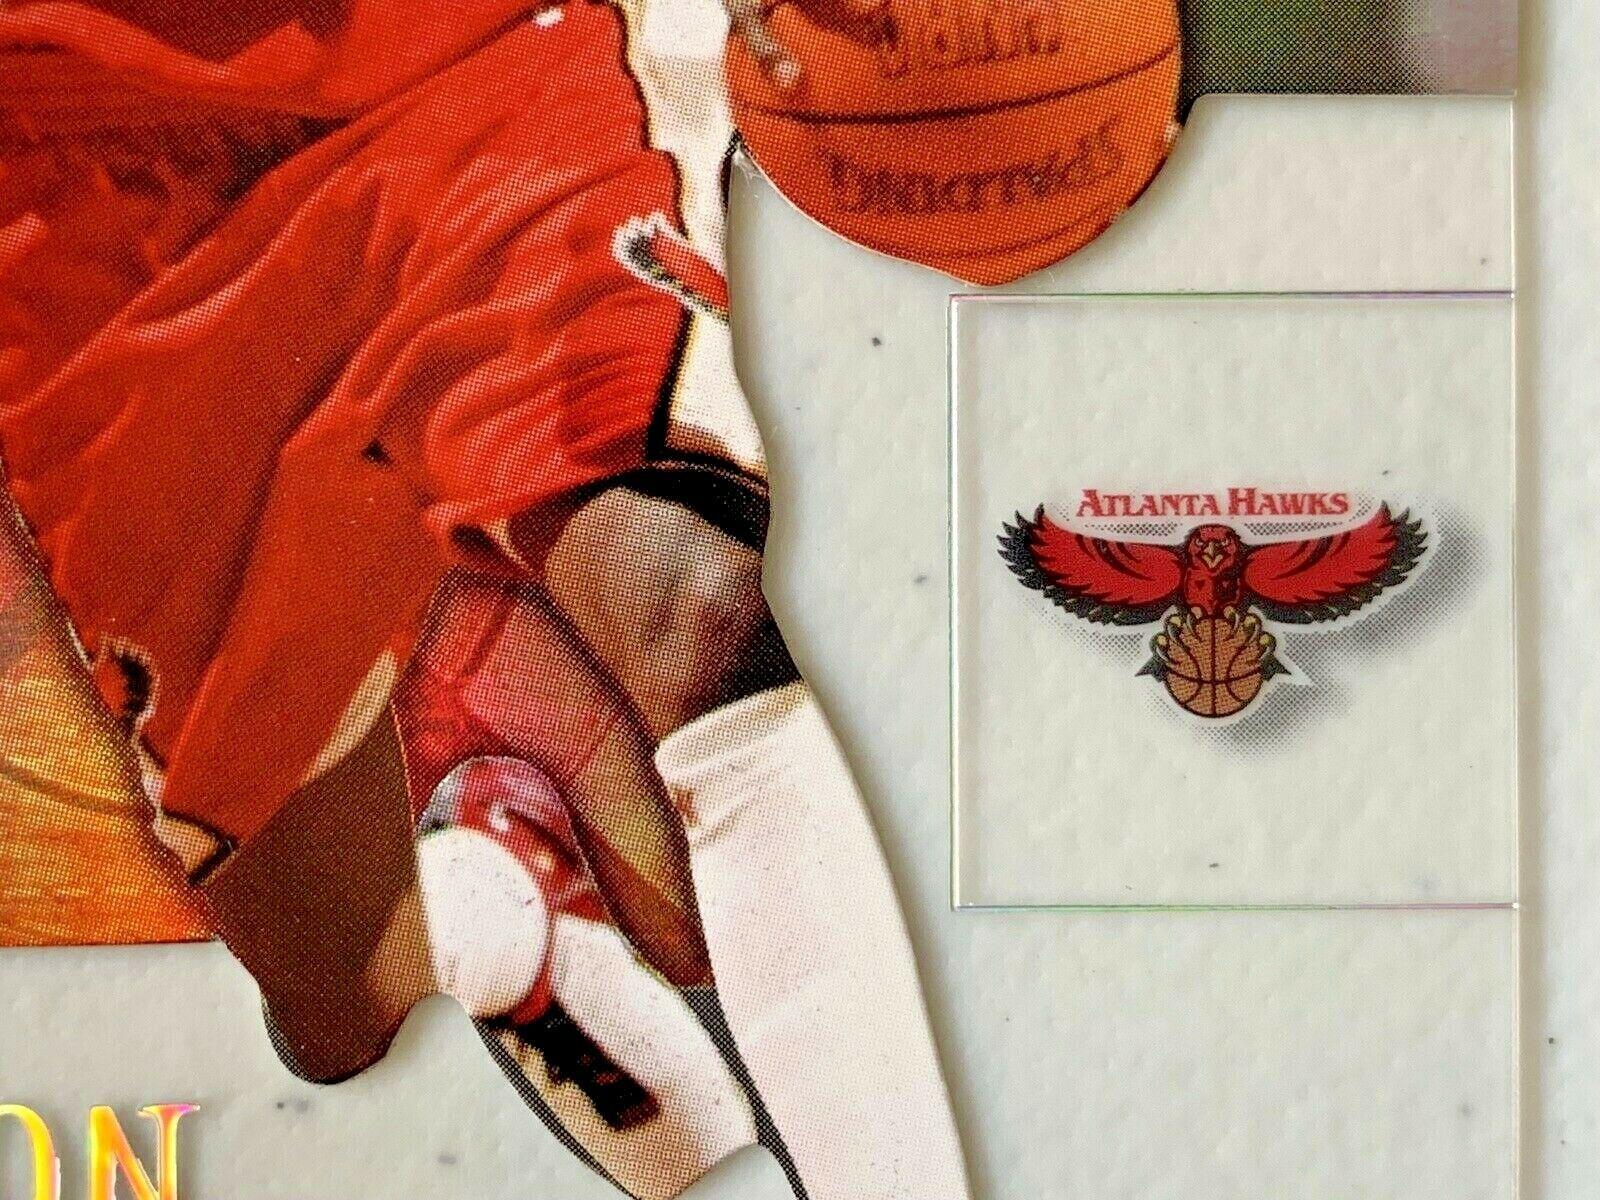 Jason Terry Now/66 #65 Atlanta Hawks Fleer Basketball Card with Hard Case 31G image 5